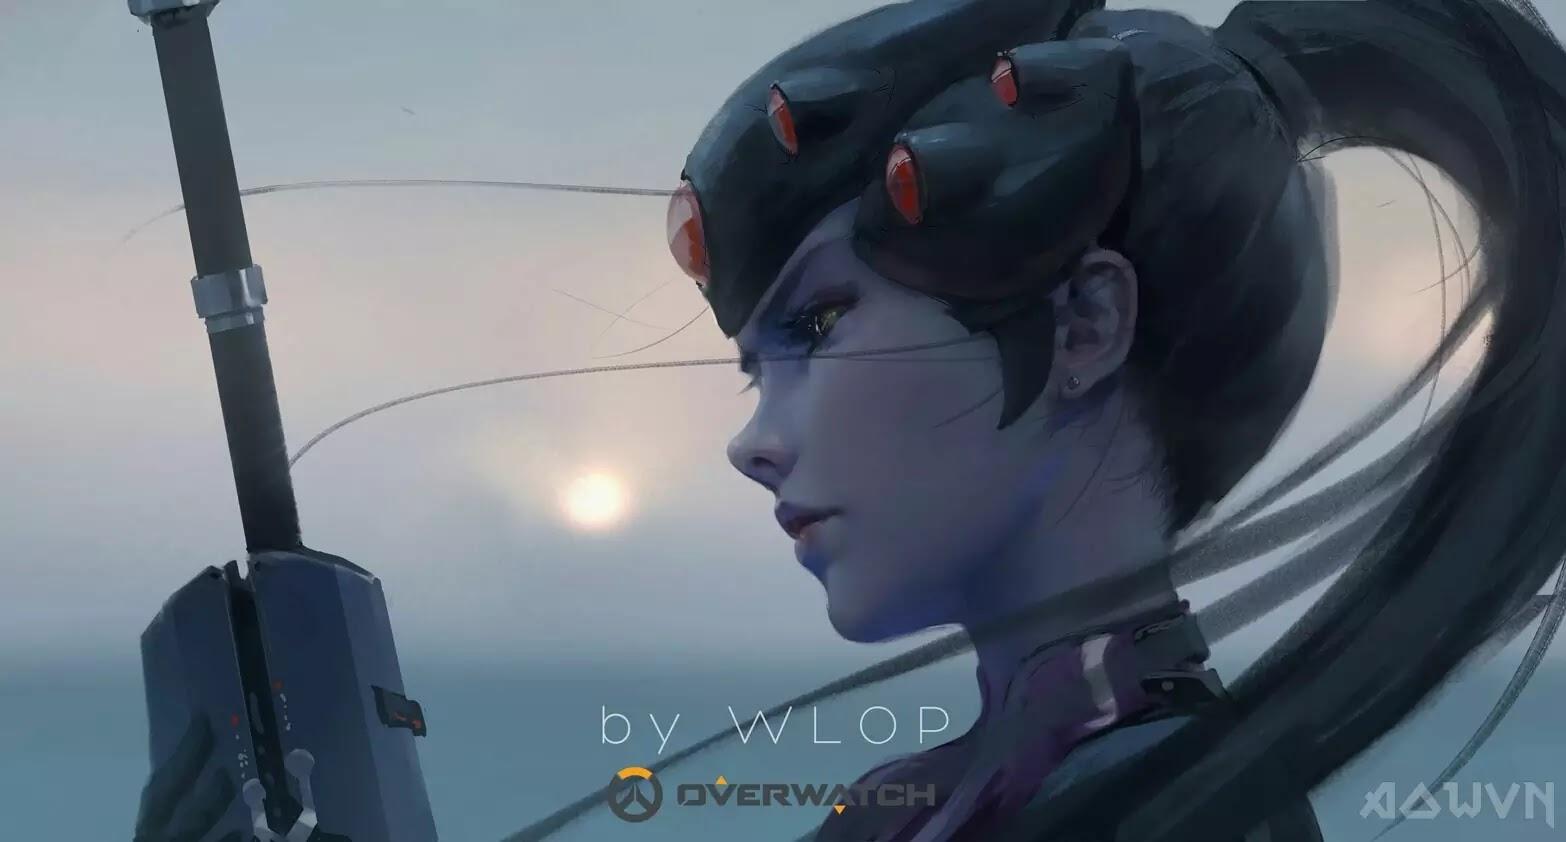 33 AowVN.org m - [ Hình Nền ] Anime Cực Đẹp by Wlop | Wallpaper Premium / Update